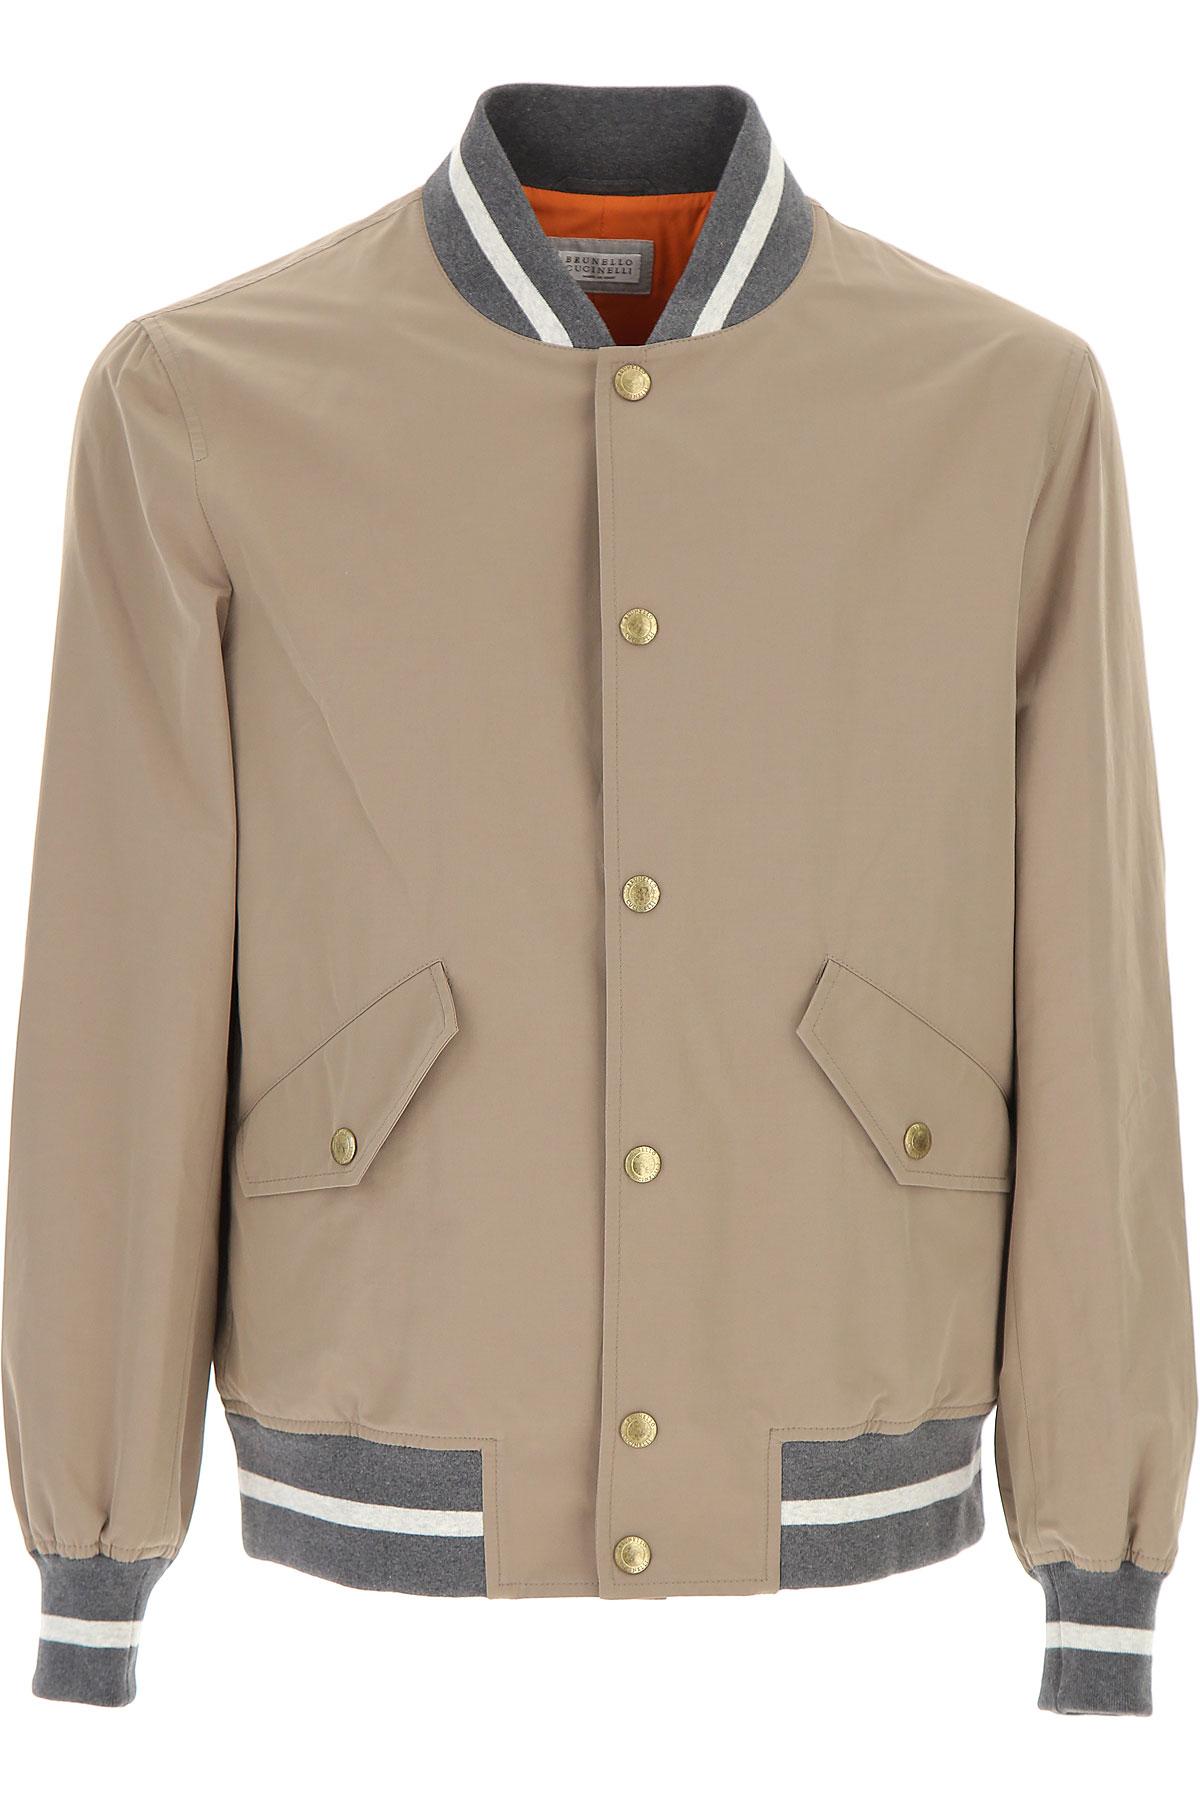 Image of Brunello Cucinelli Jacket for Men On Sale, Beige, polyestere, 2017, L M XL